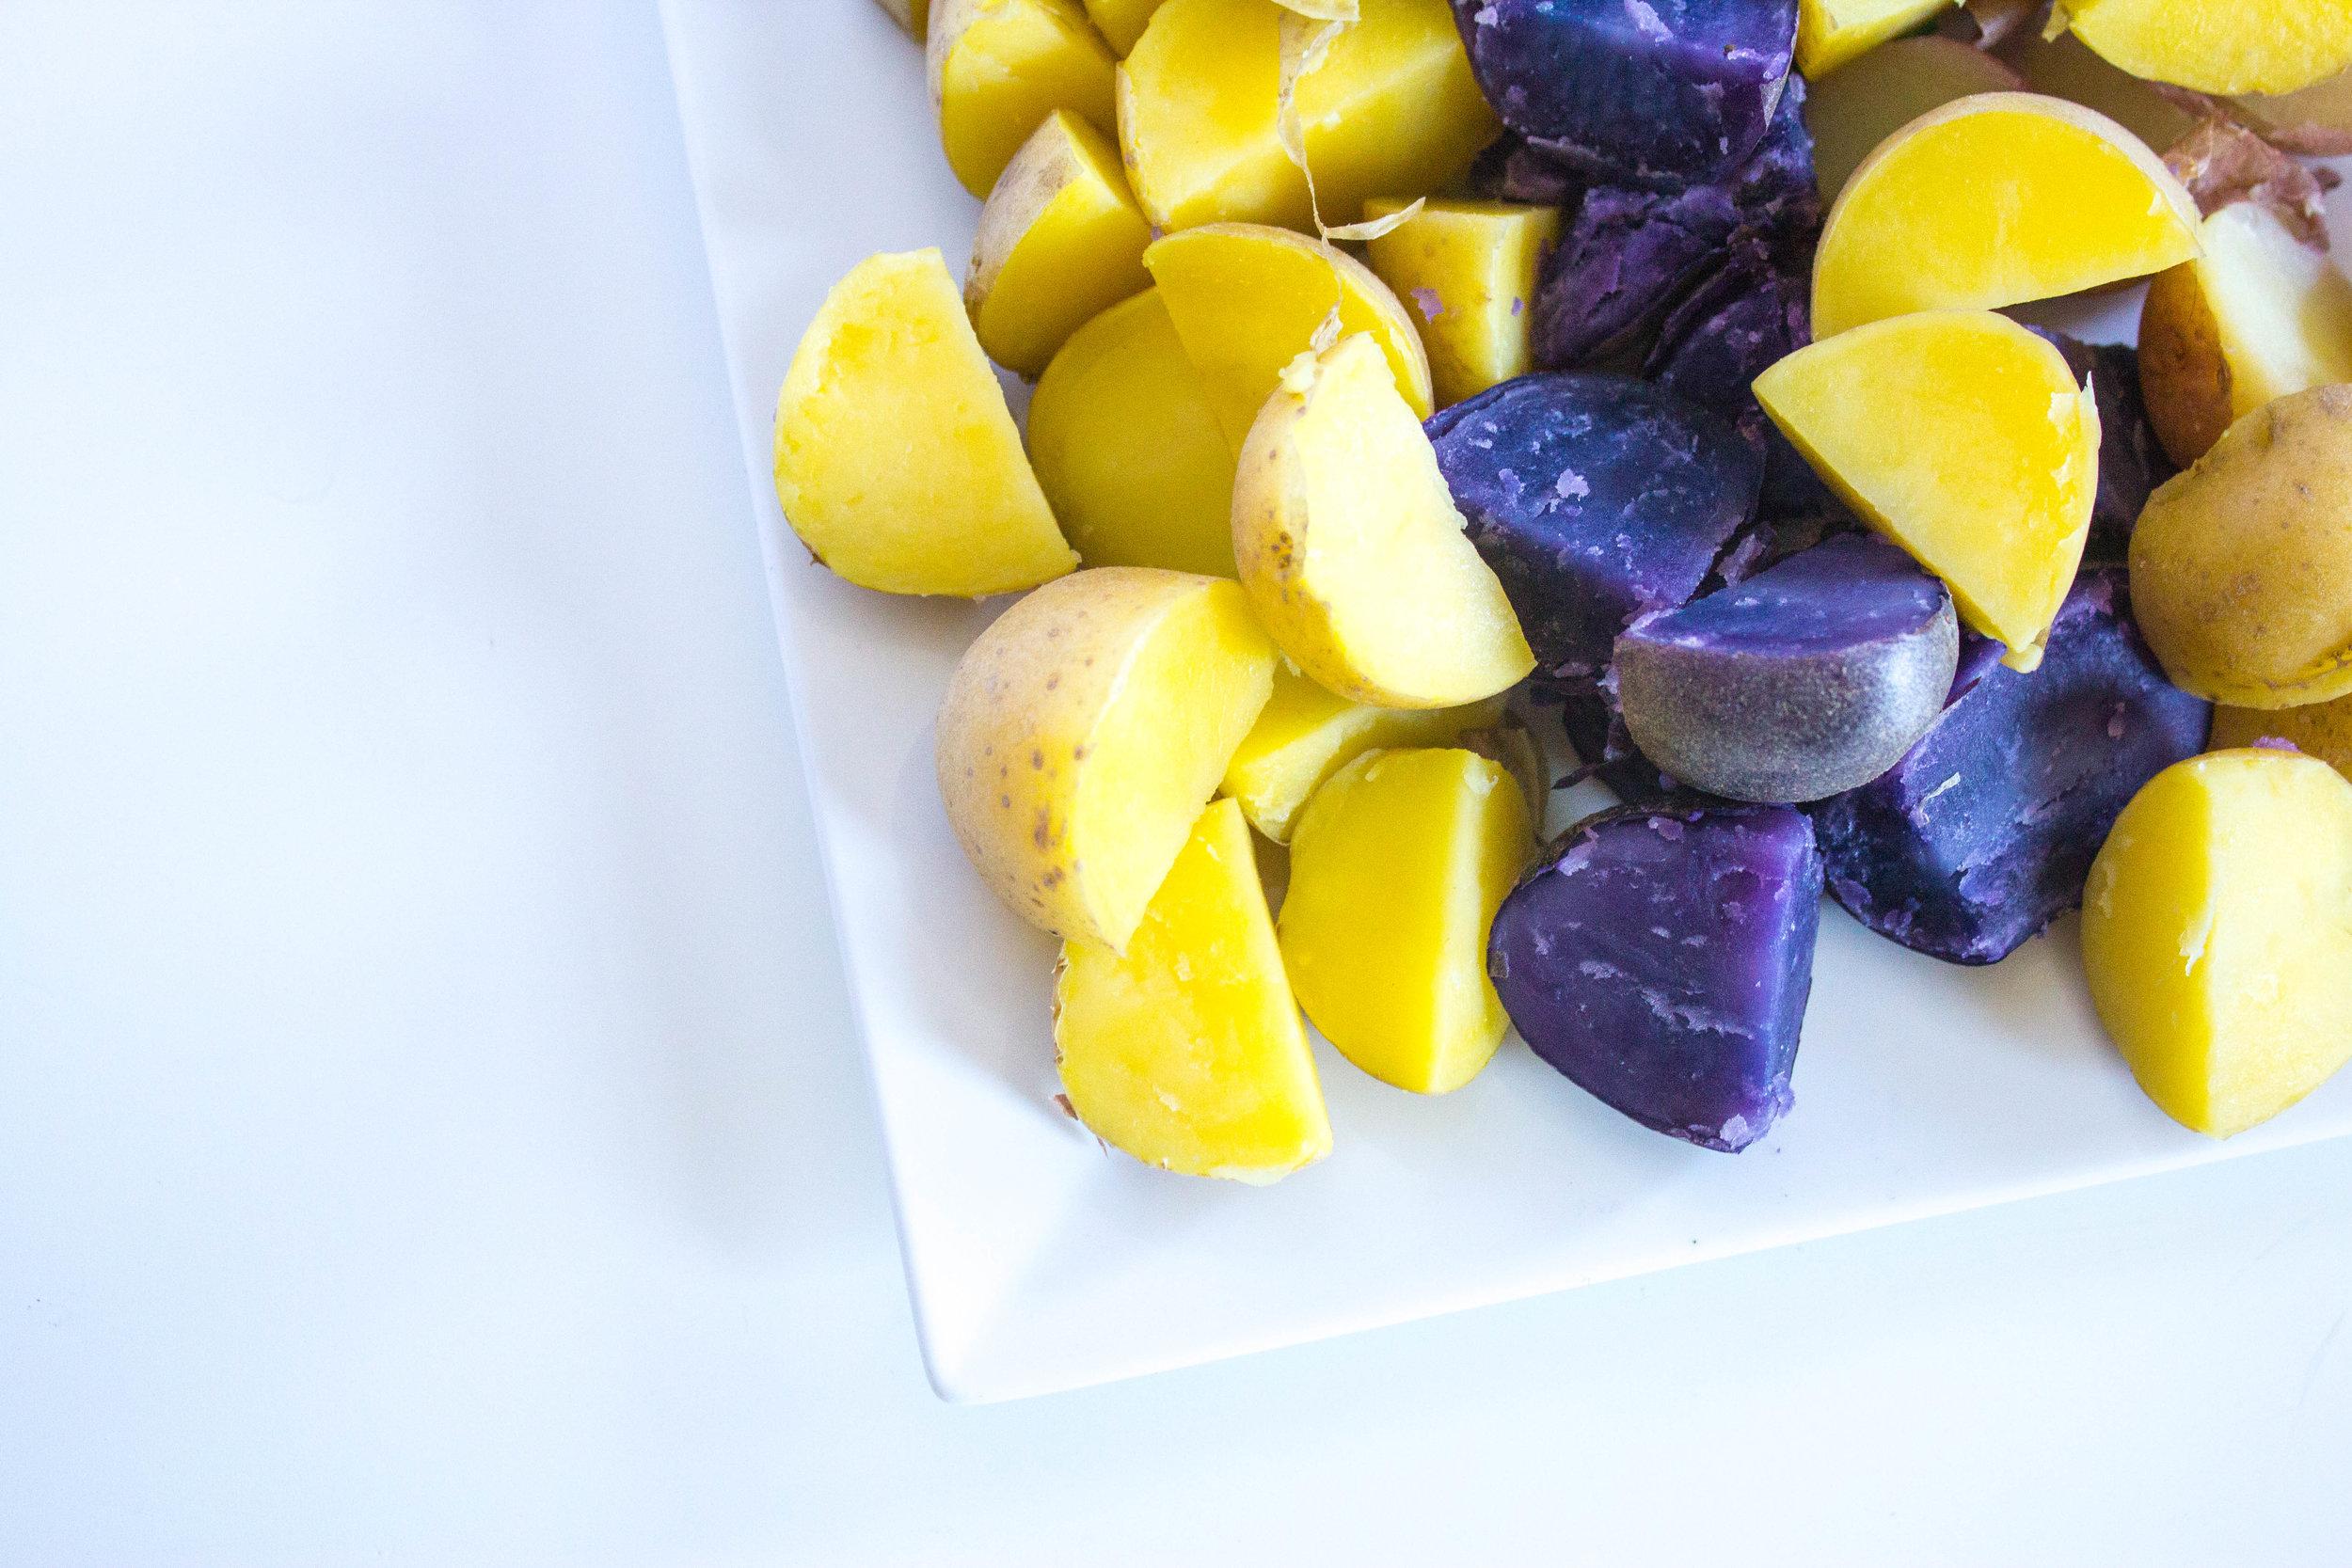 Beautiful jewel-toned new potatoes ready for my German Potato Salad.